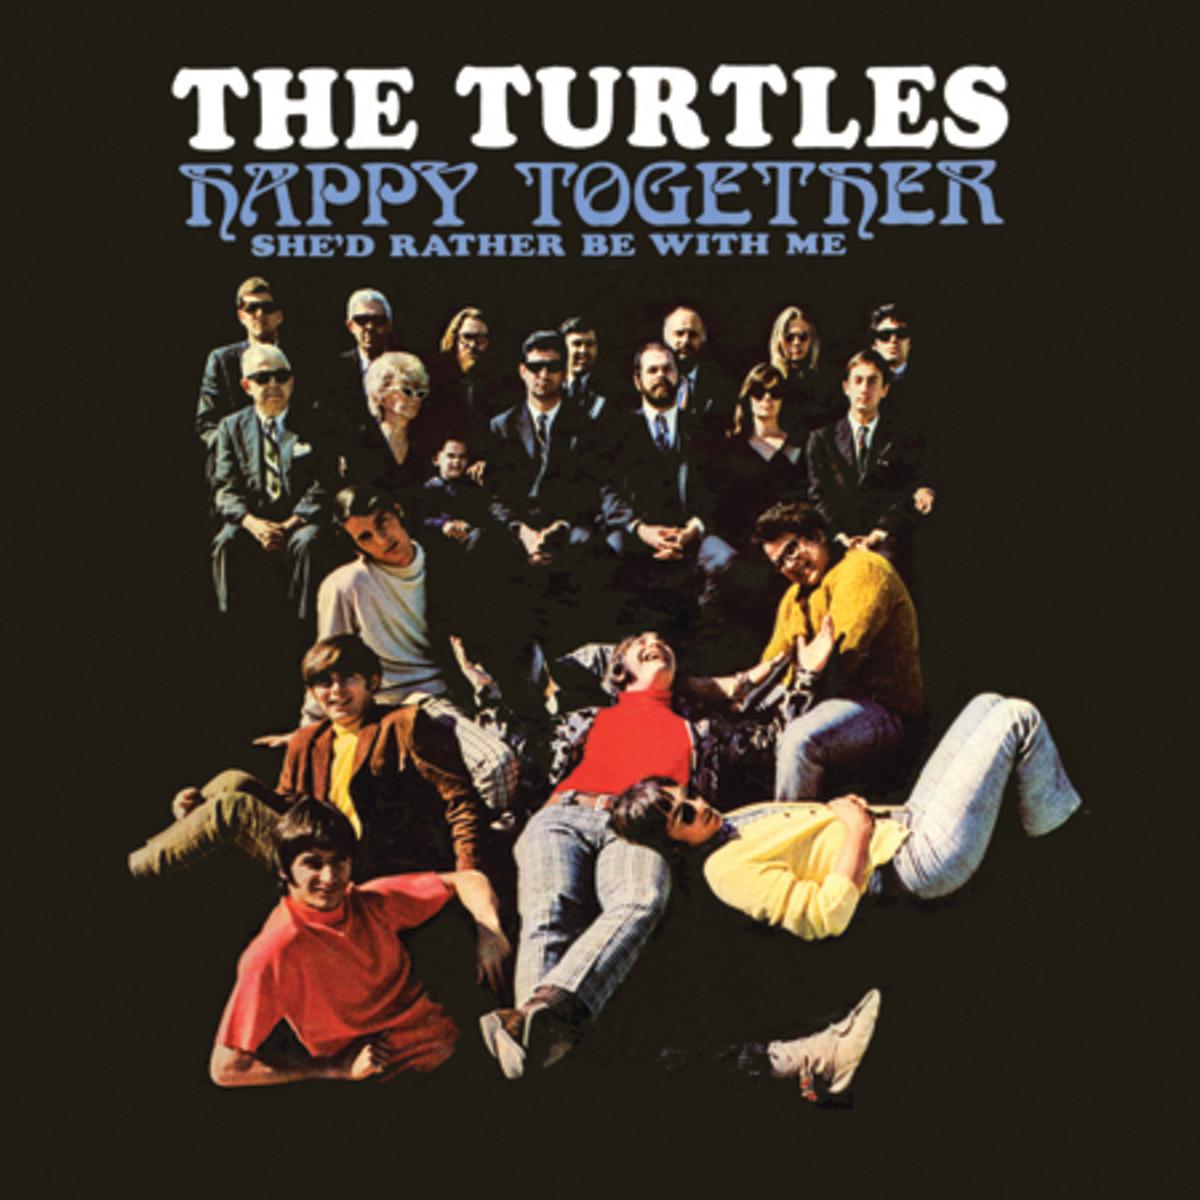 turtles HappyTogether